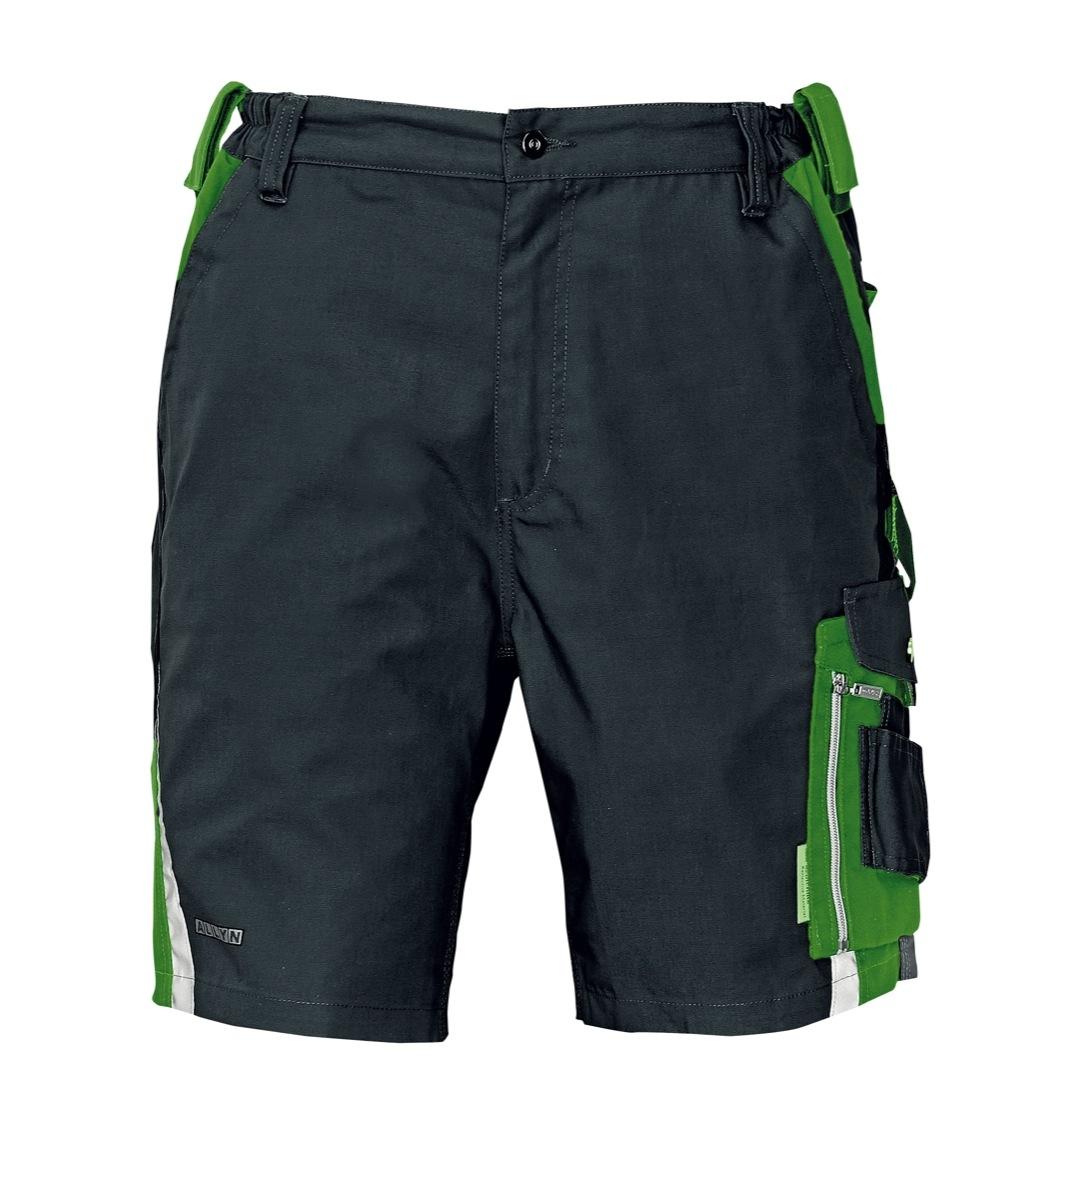 ALLYN rövidnadrág zöld-fekete